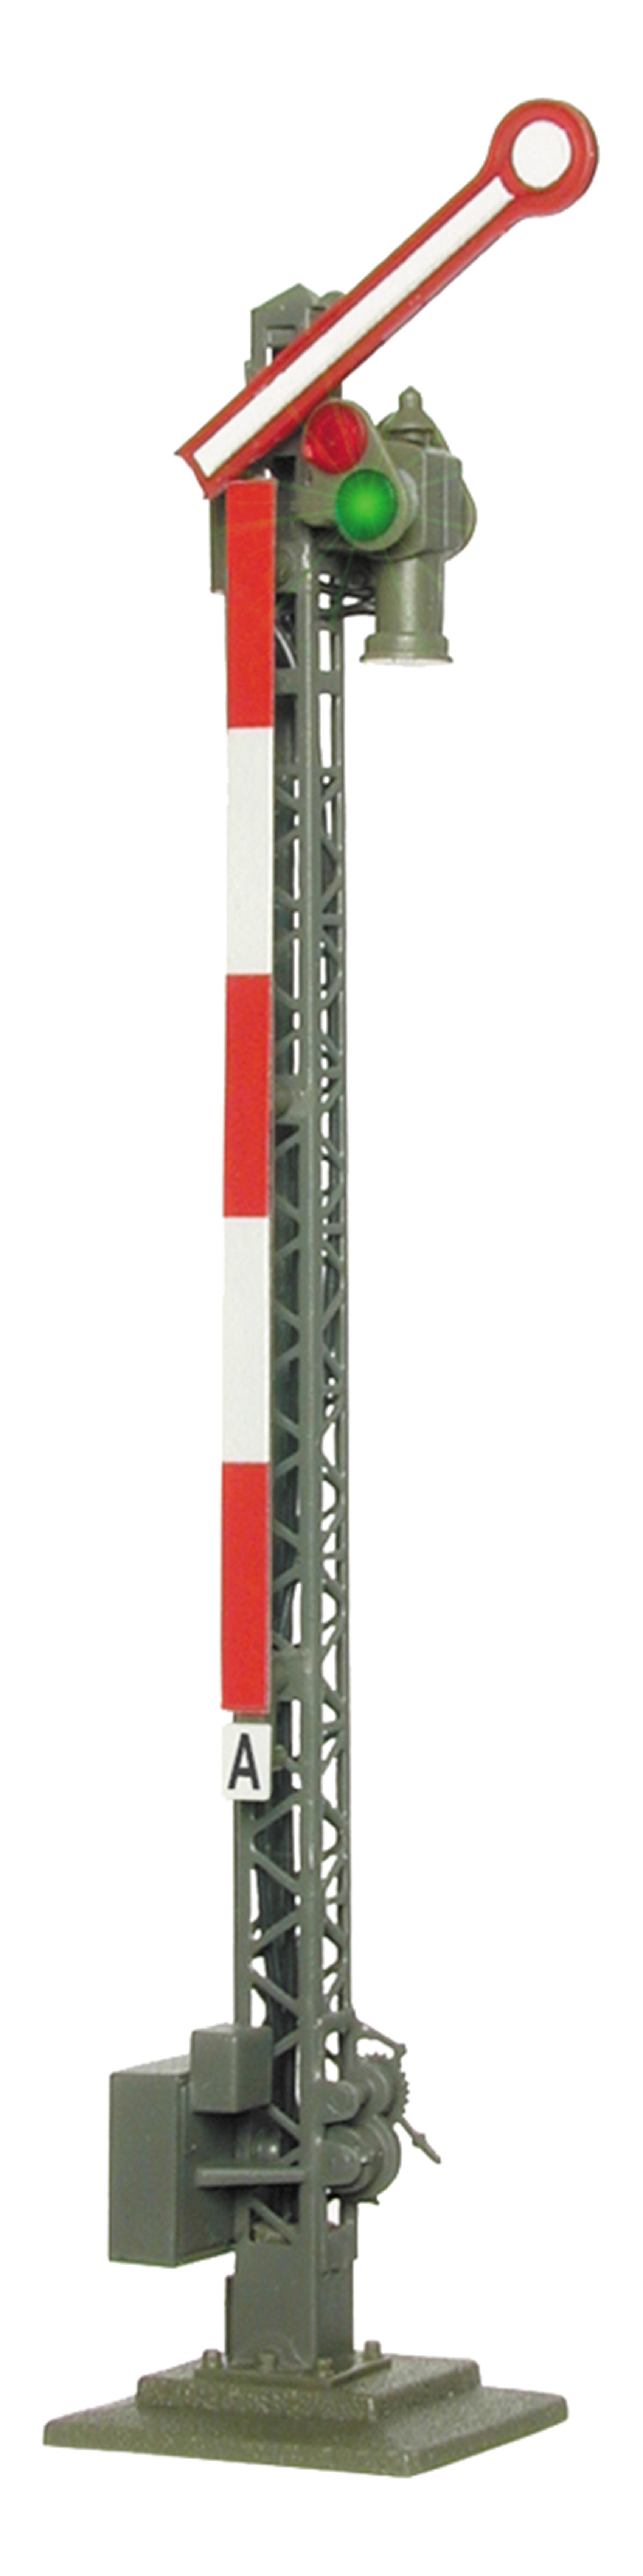 Viessmann 4900 <br/>Form-Hauptsignal, 1-flügelig